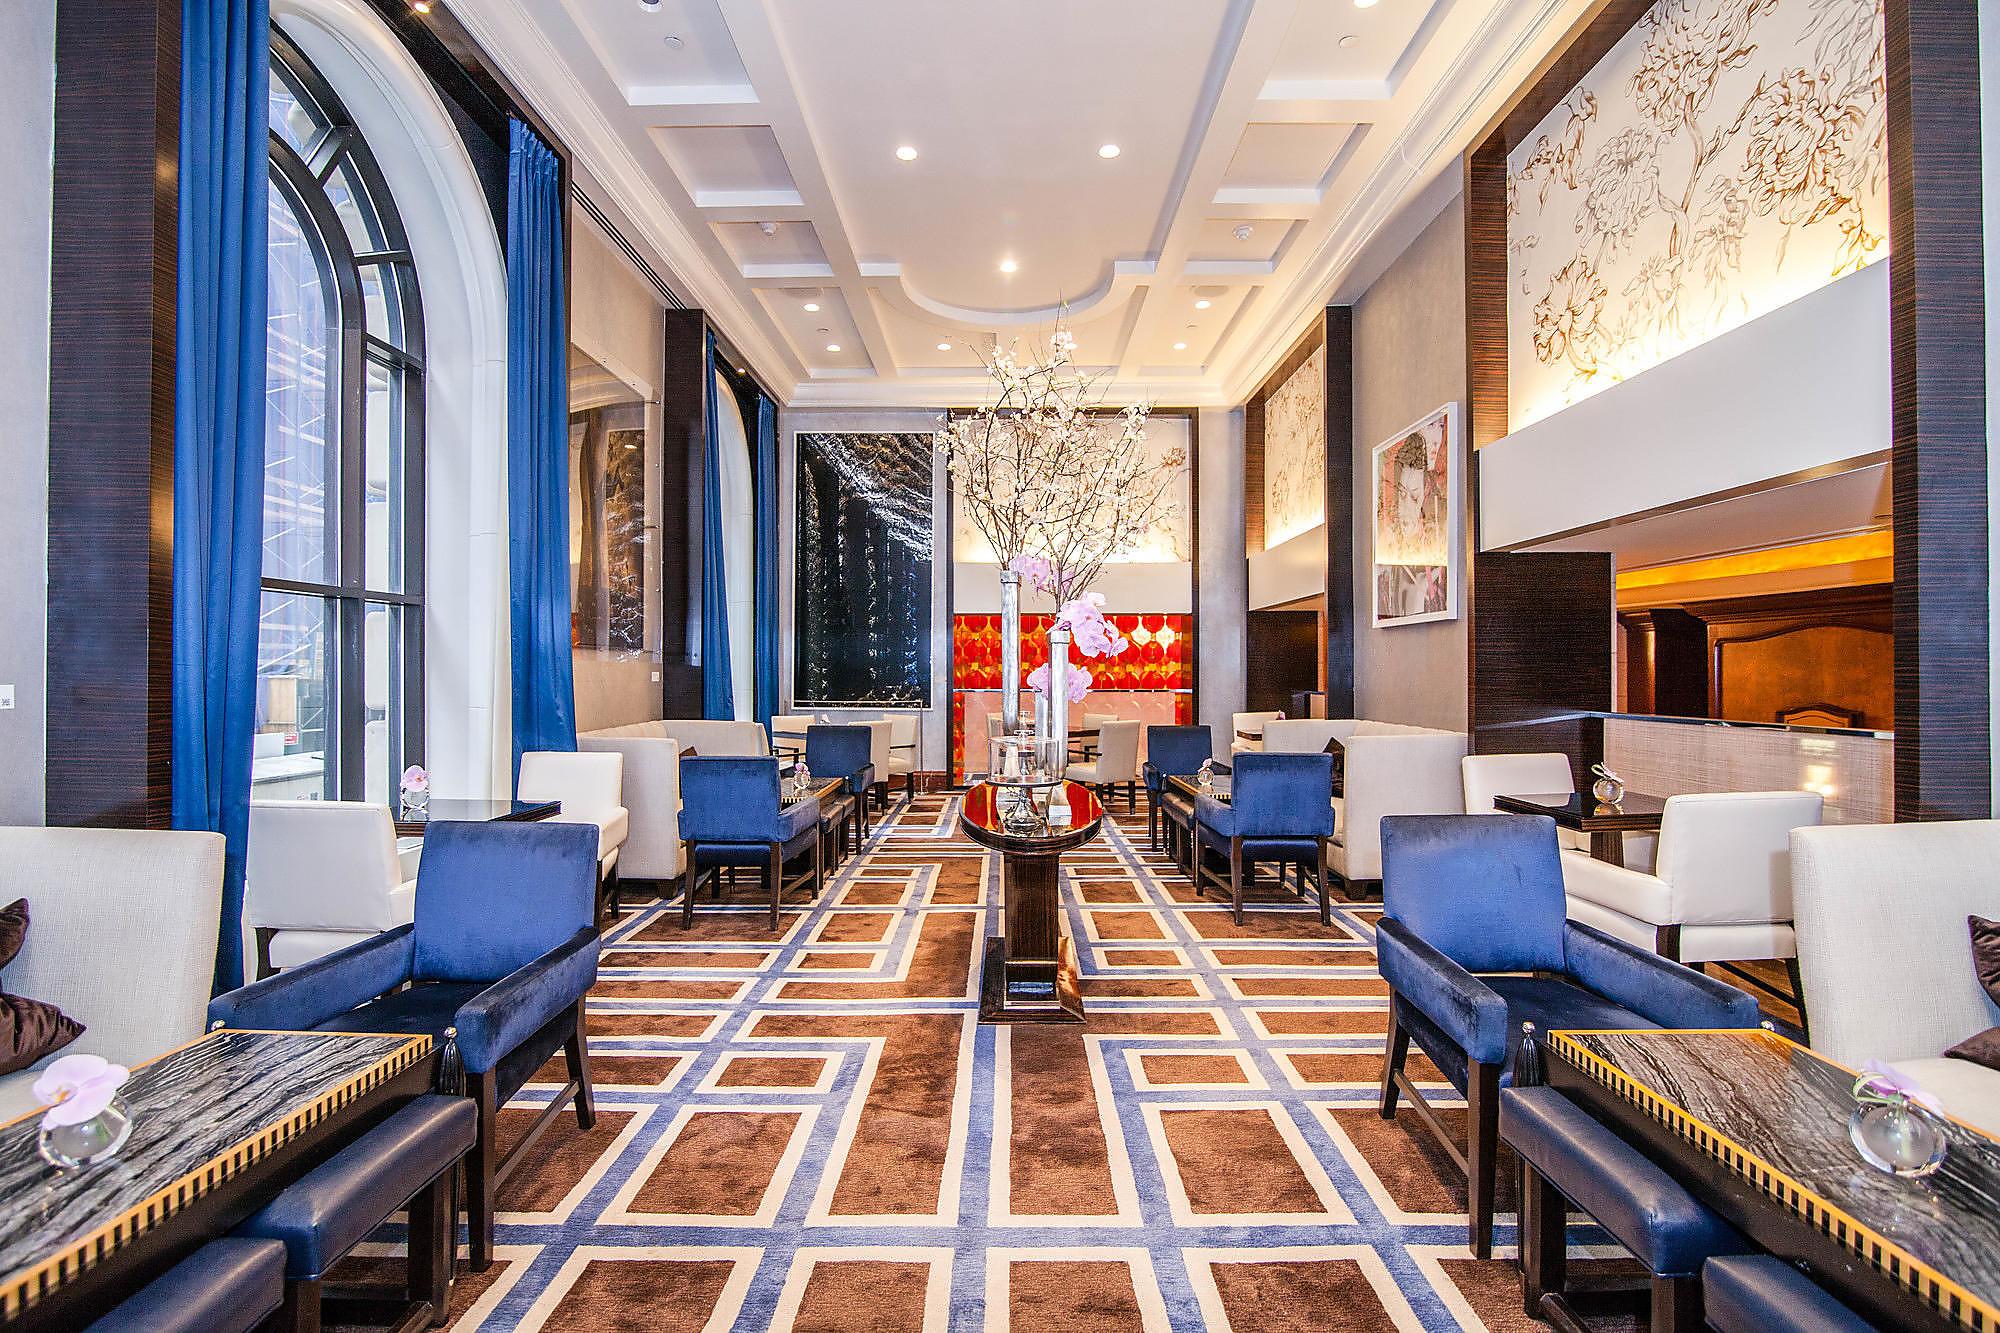 The Gotham Lounge at The Peninsula New York.